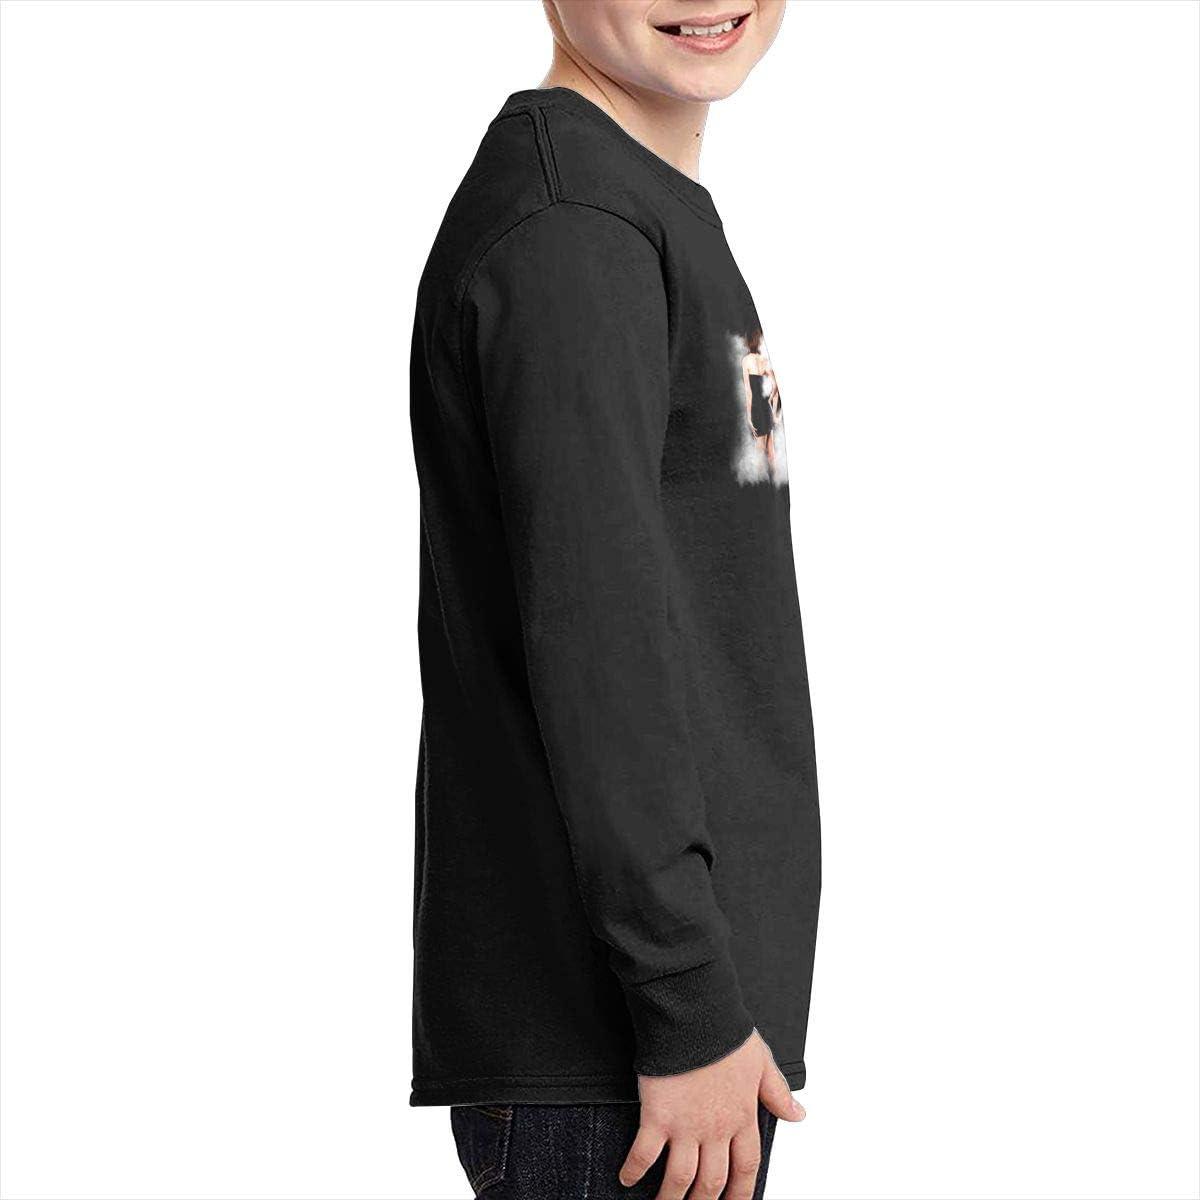 RhteGui Spice Up Your Life Spice Girls Boys /& Girls Junior Vintage Long Sleeve T-Shirt Black